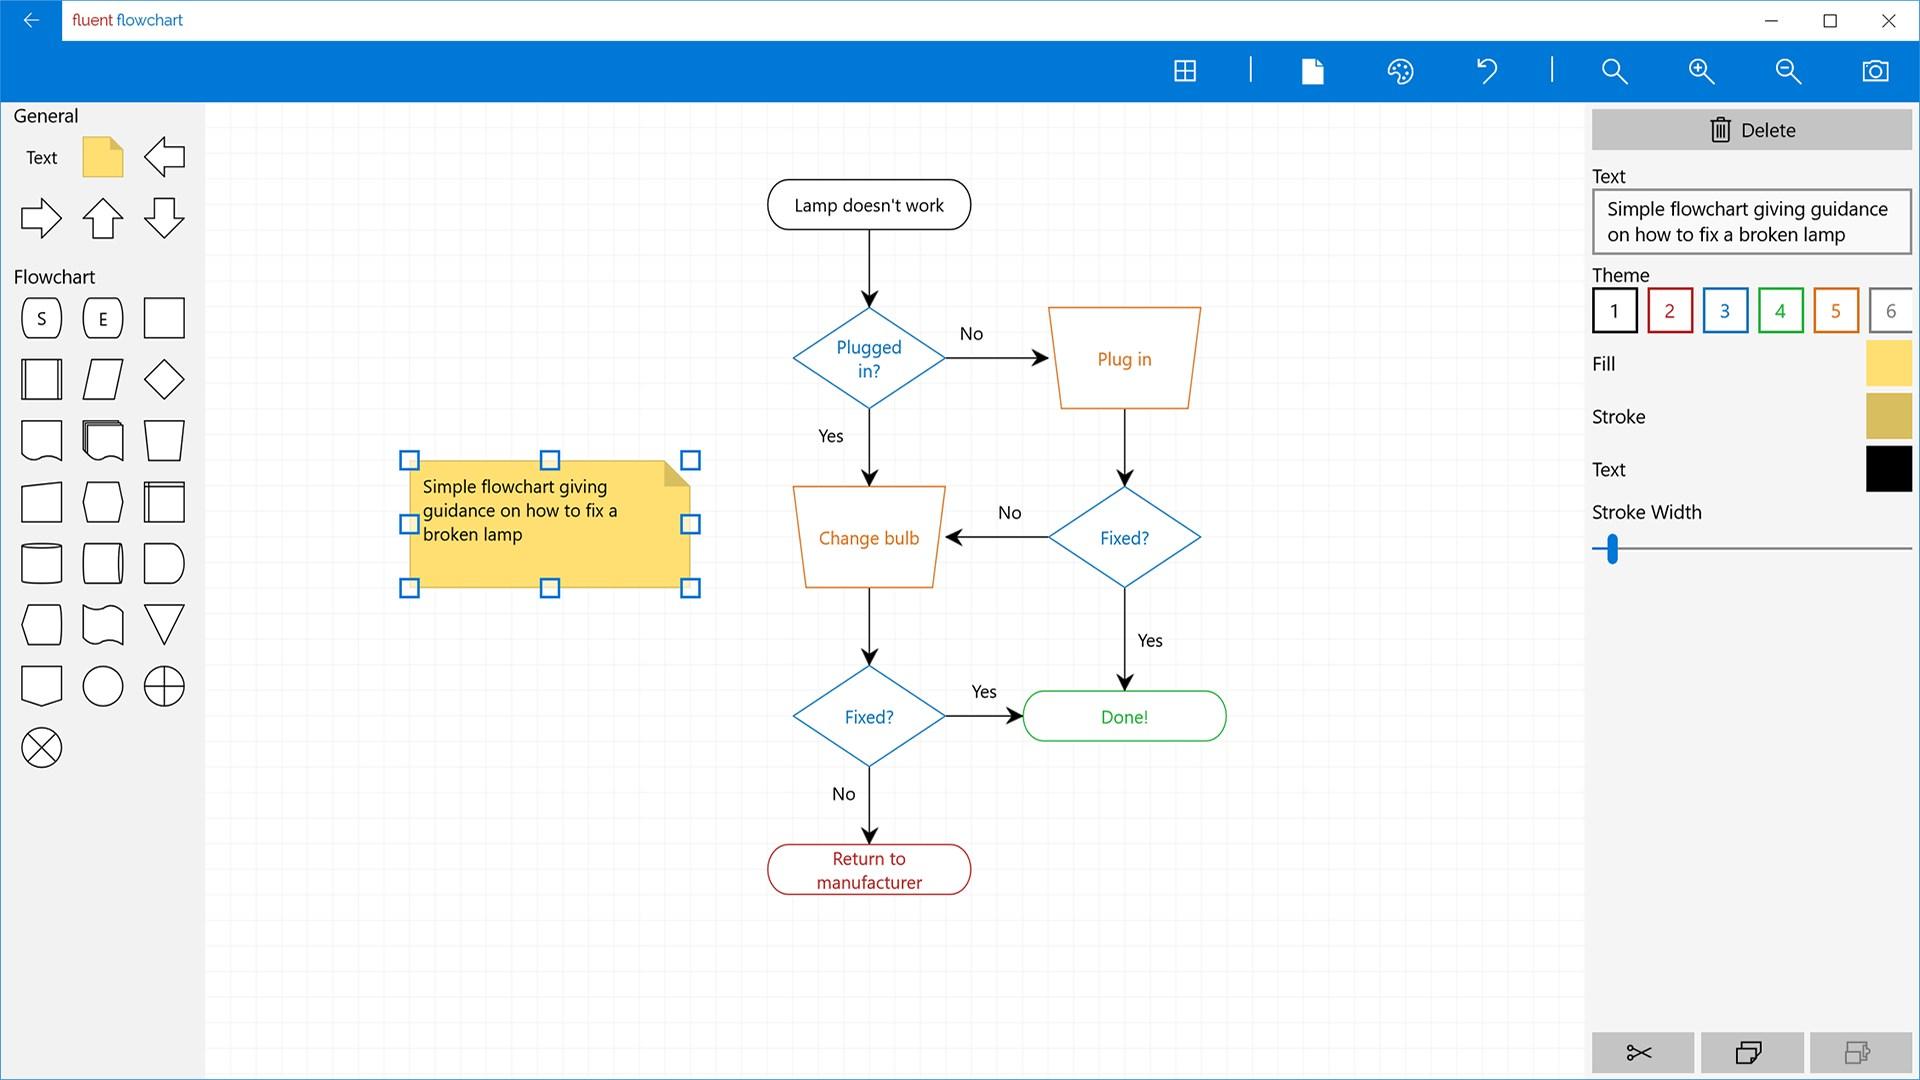 Get Fluent Flowchart - Microsoft Store